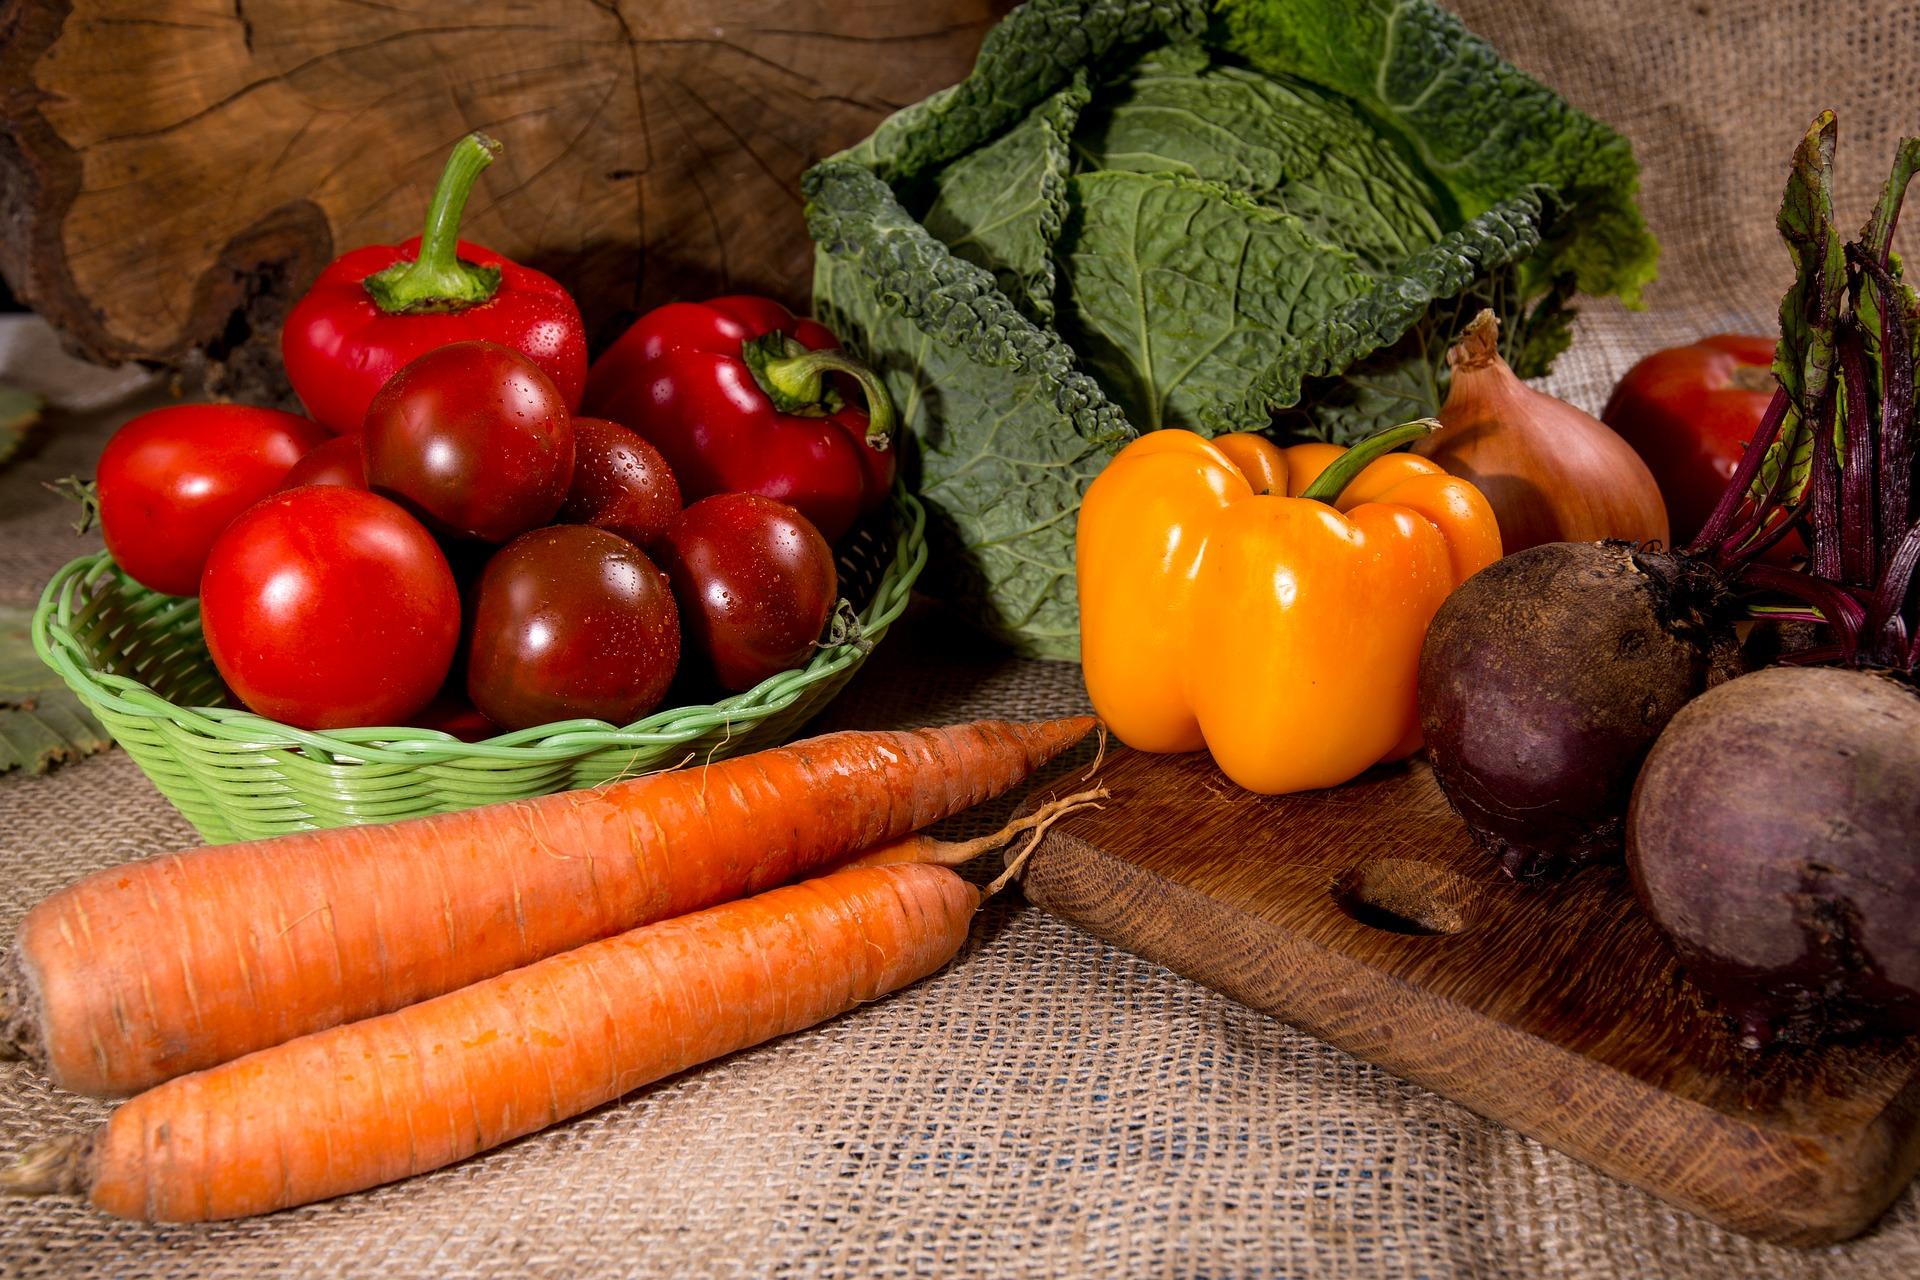 zelenina na stole